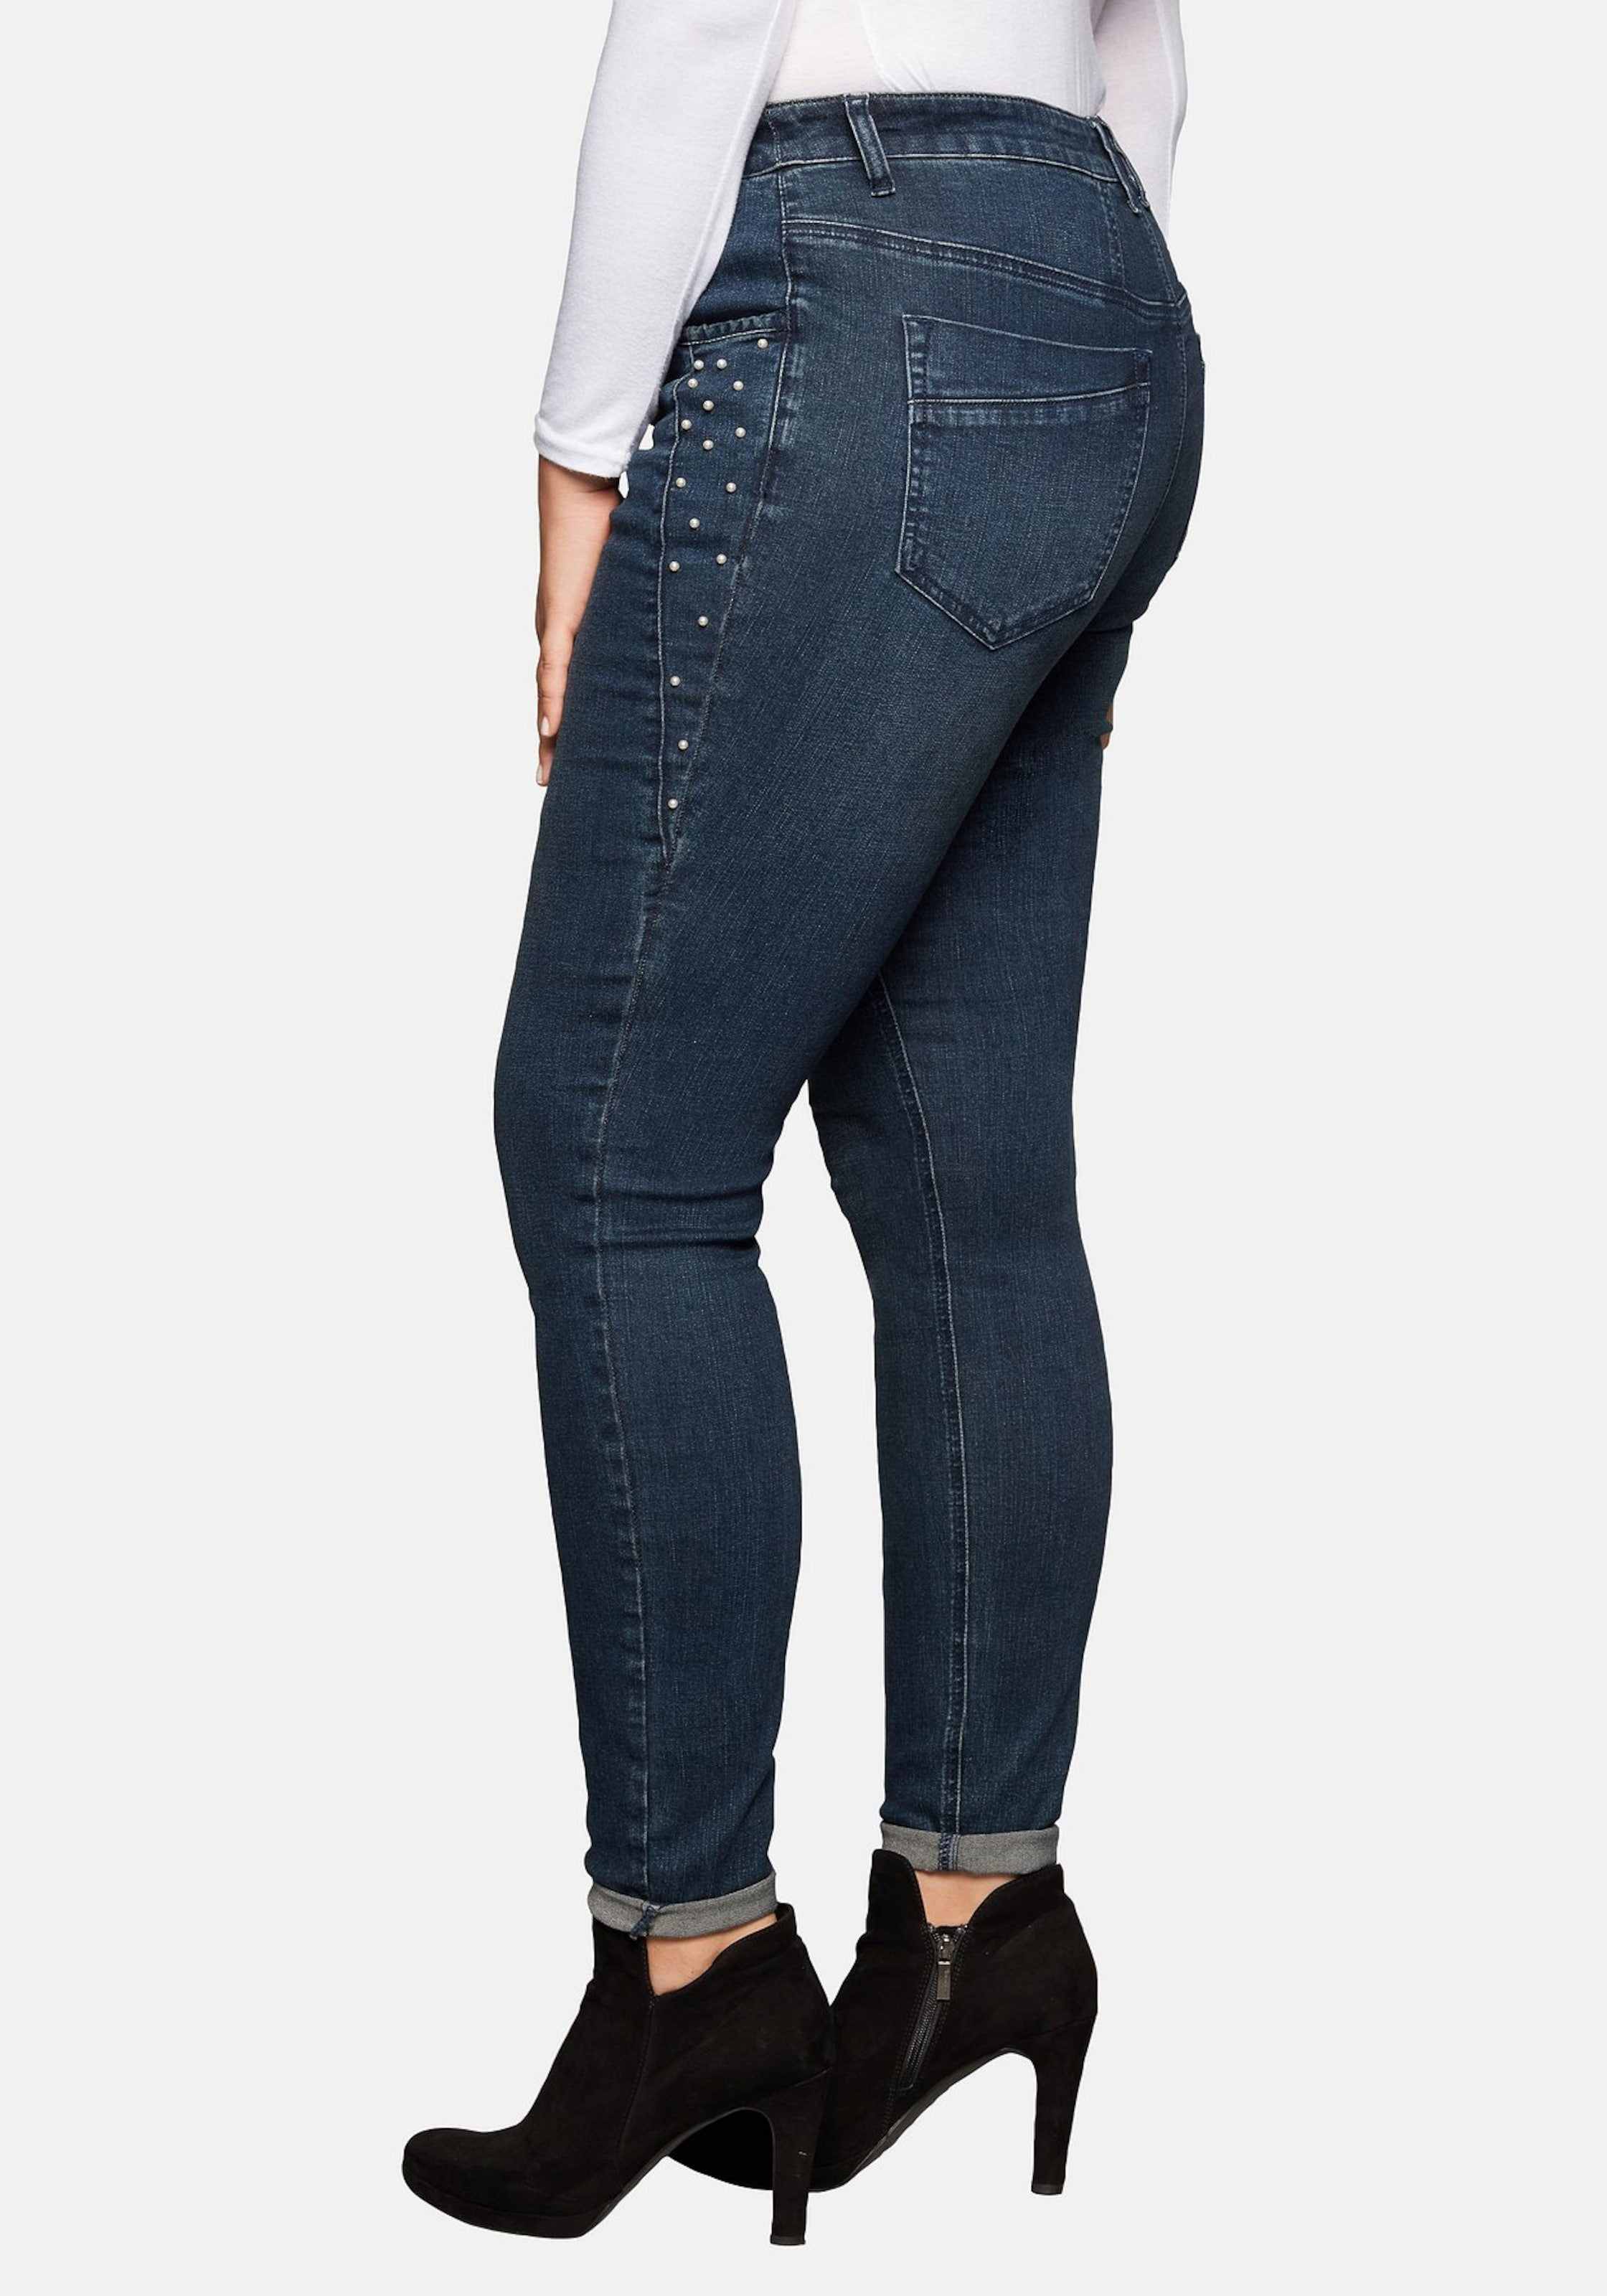 Jeans Denim In Sheego Jeans In Dunkelblau Sheego Denim EIWDHY29